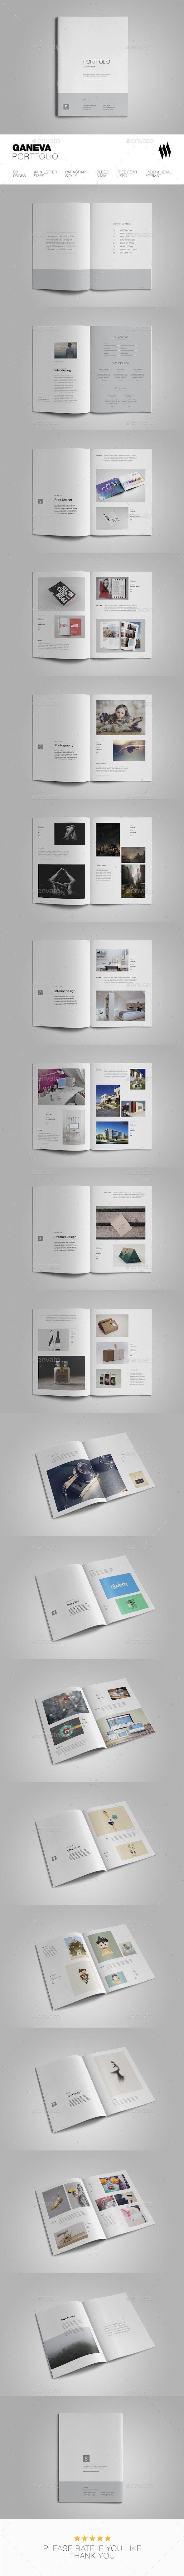 Geneva Portfolio | Architektur-Portfolio, Bewerbung und Portfolio